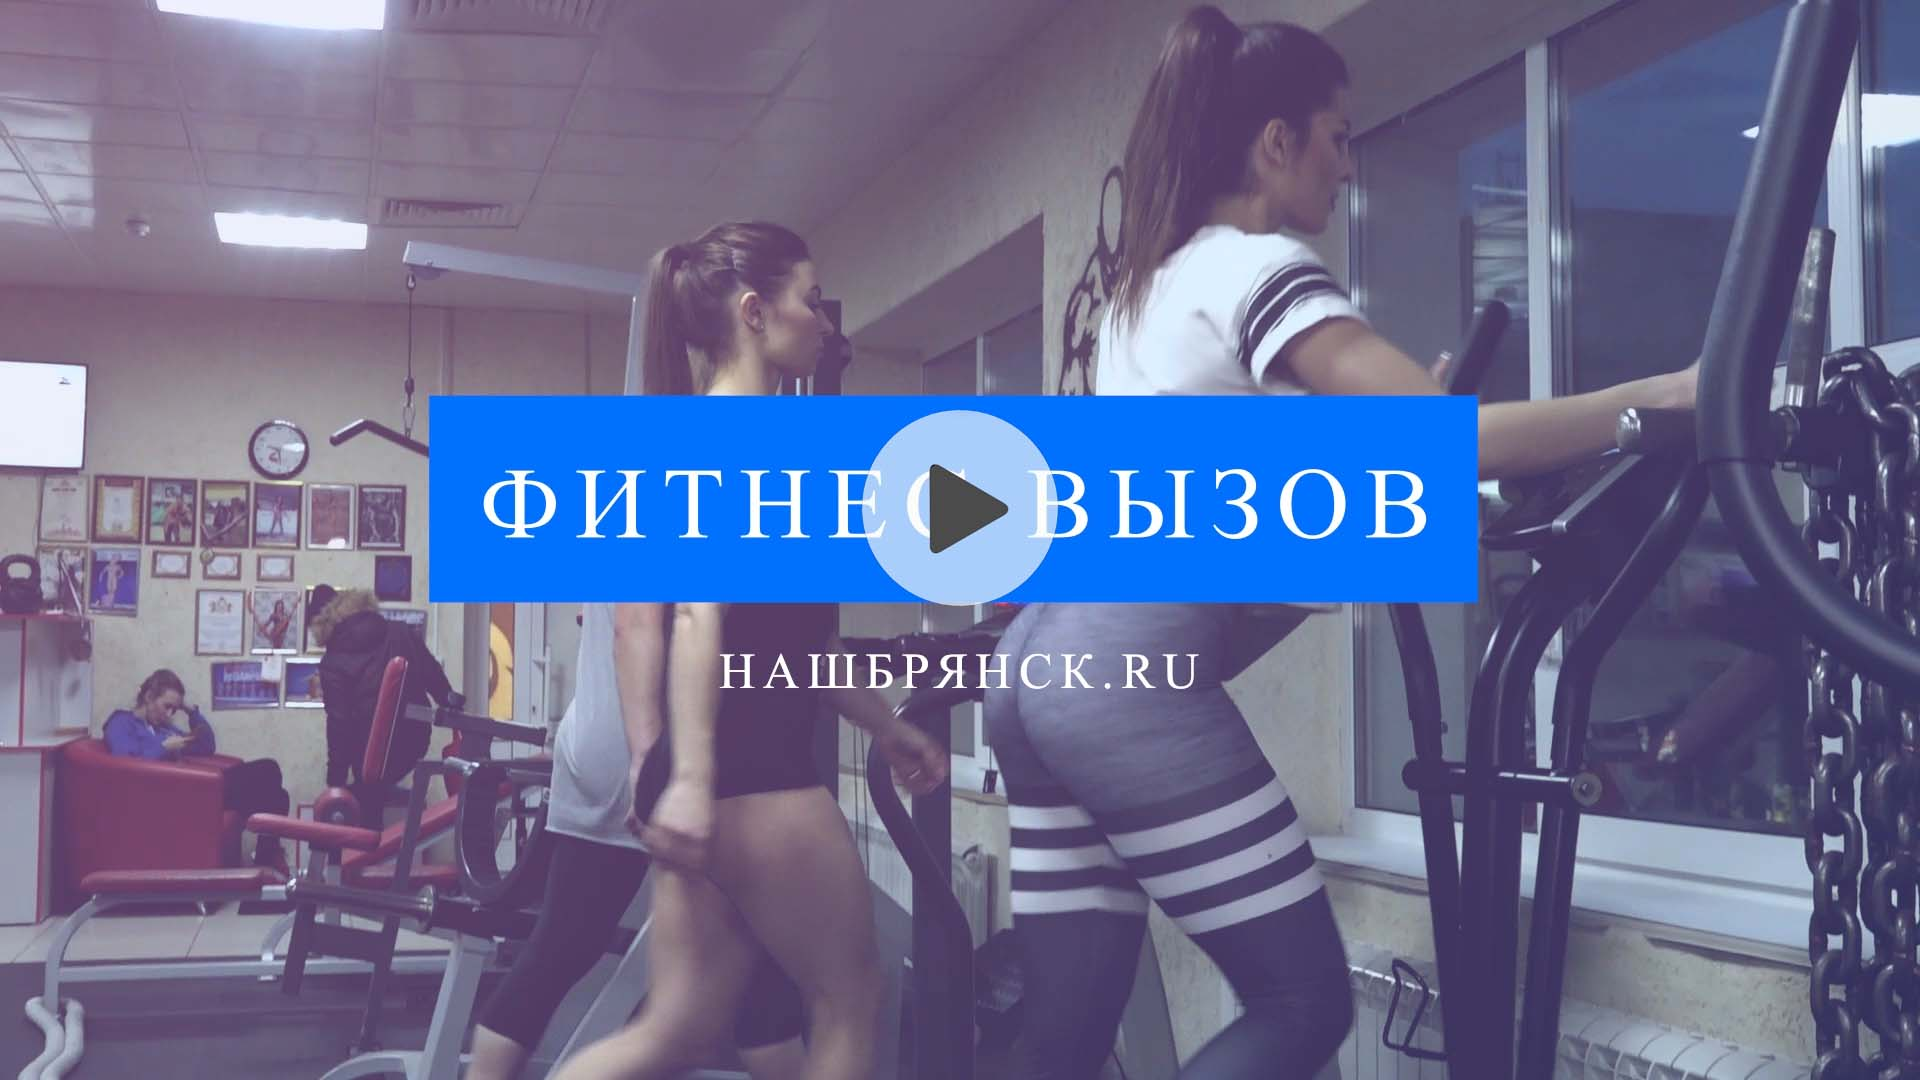 Видео-анонс конкурса